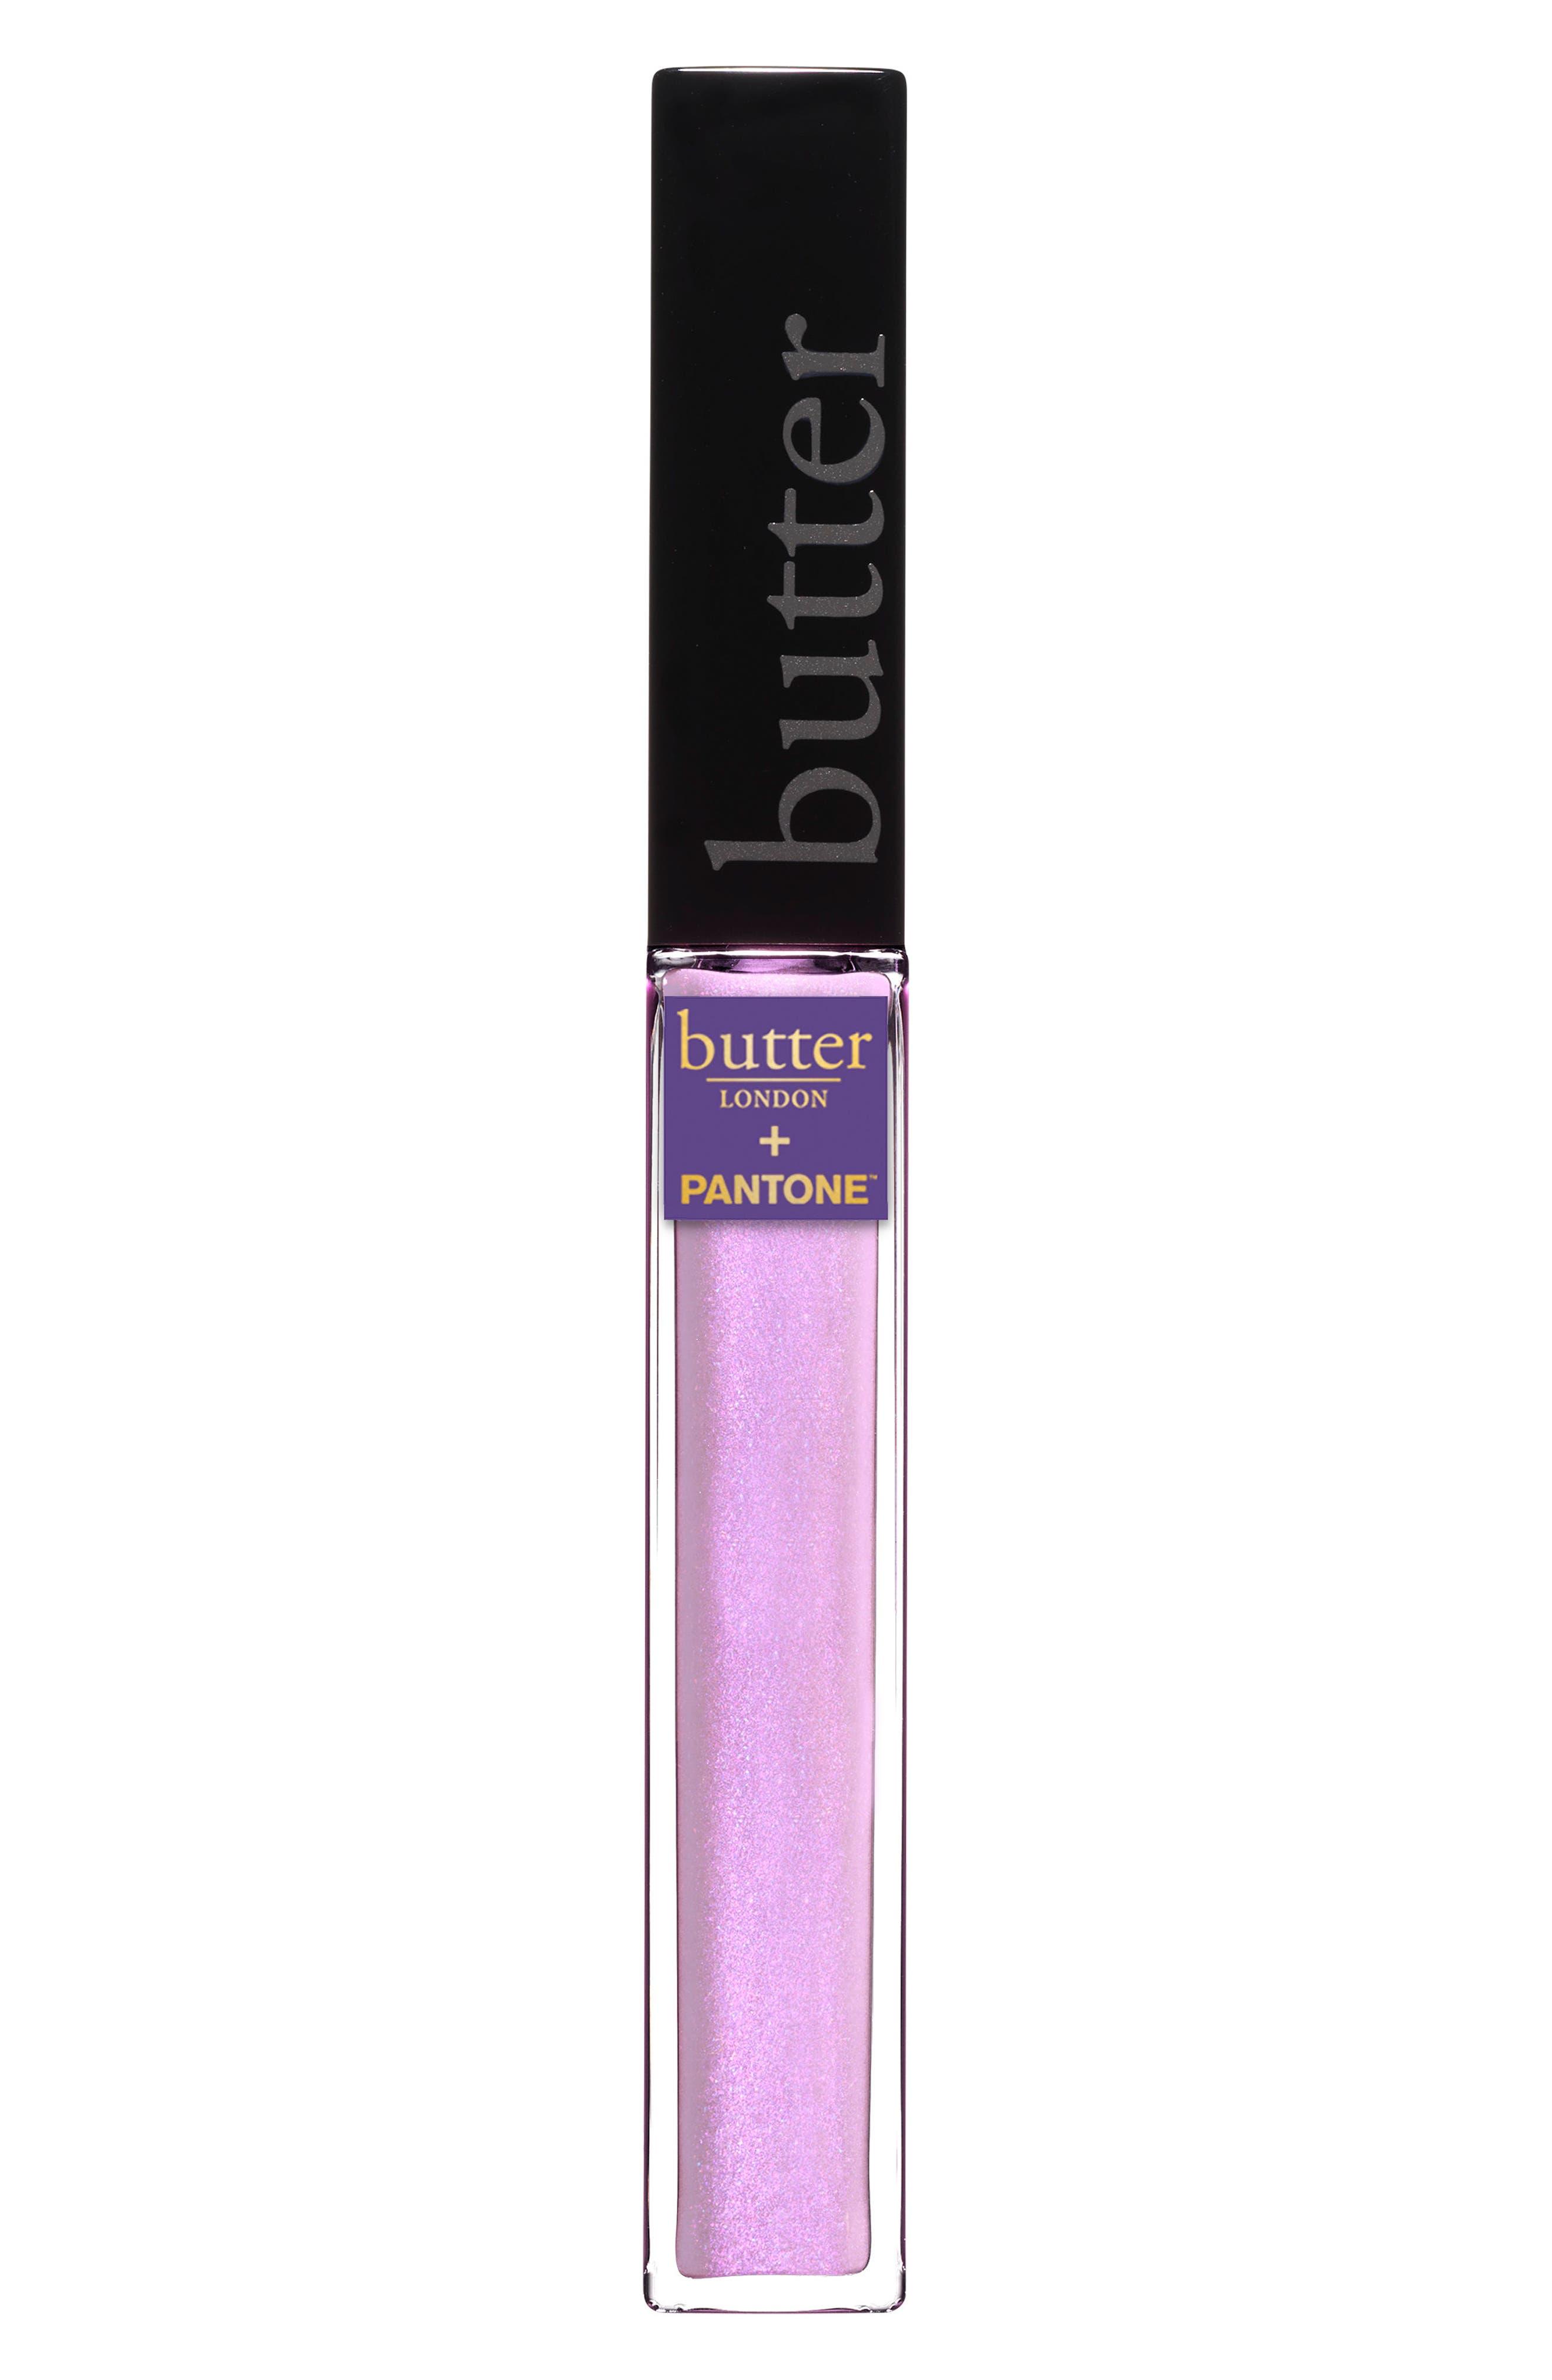 butter LONDON + Pantone™ Color of the Year 2018 Plush Rush Lip Gloss